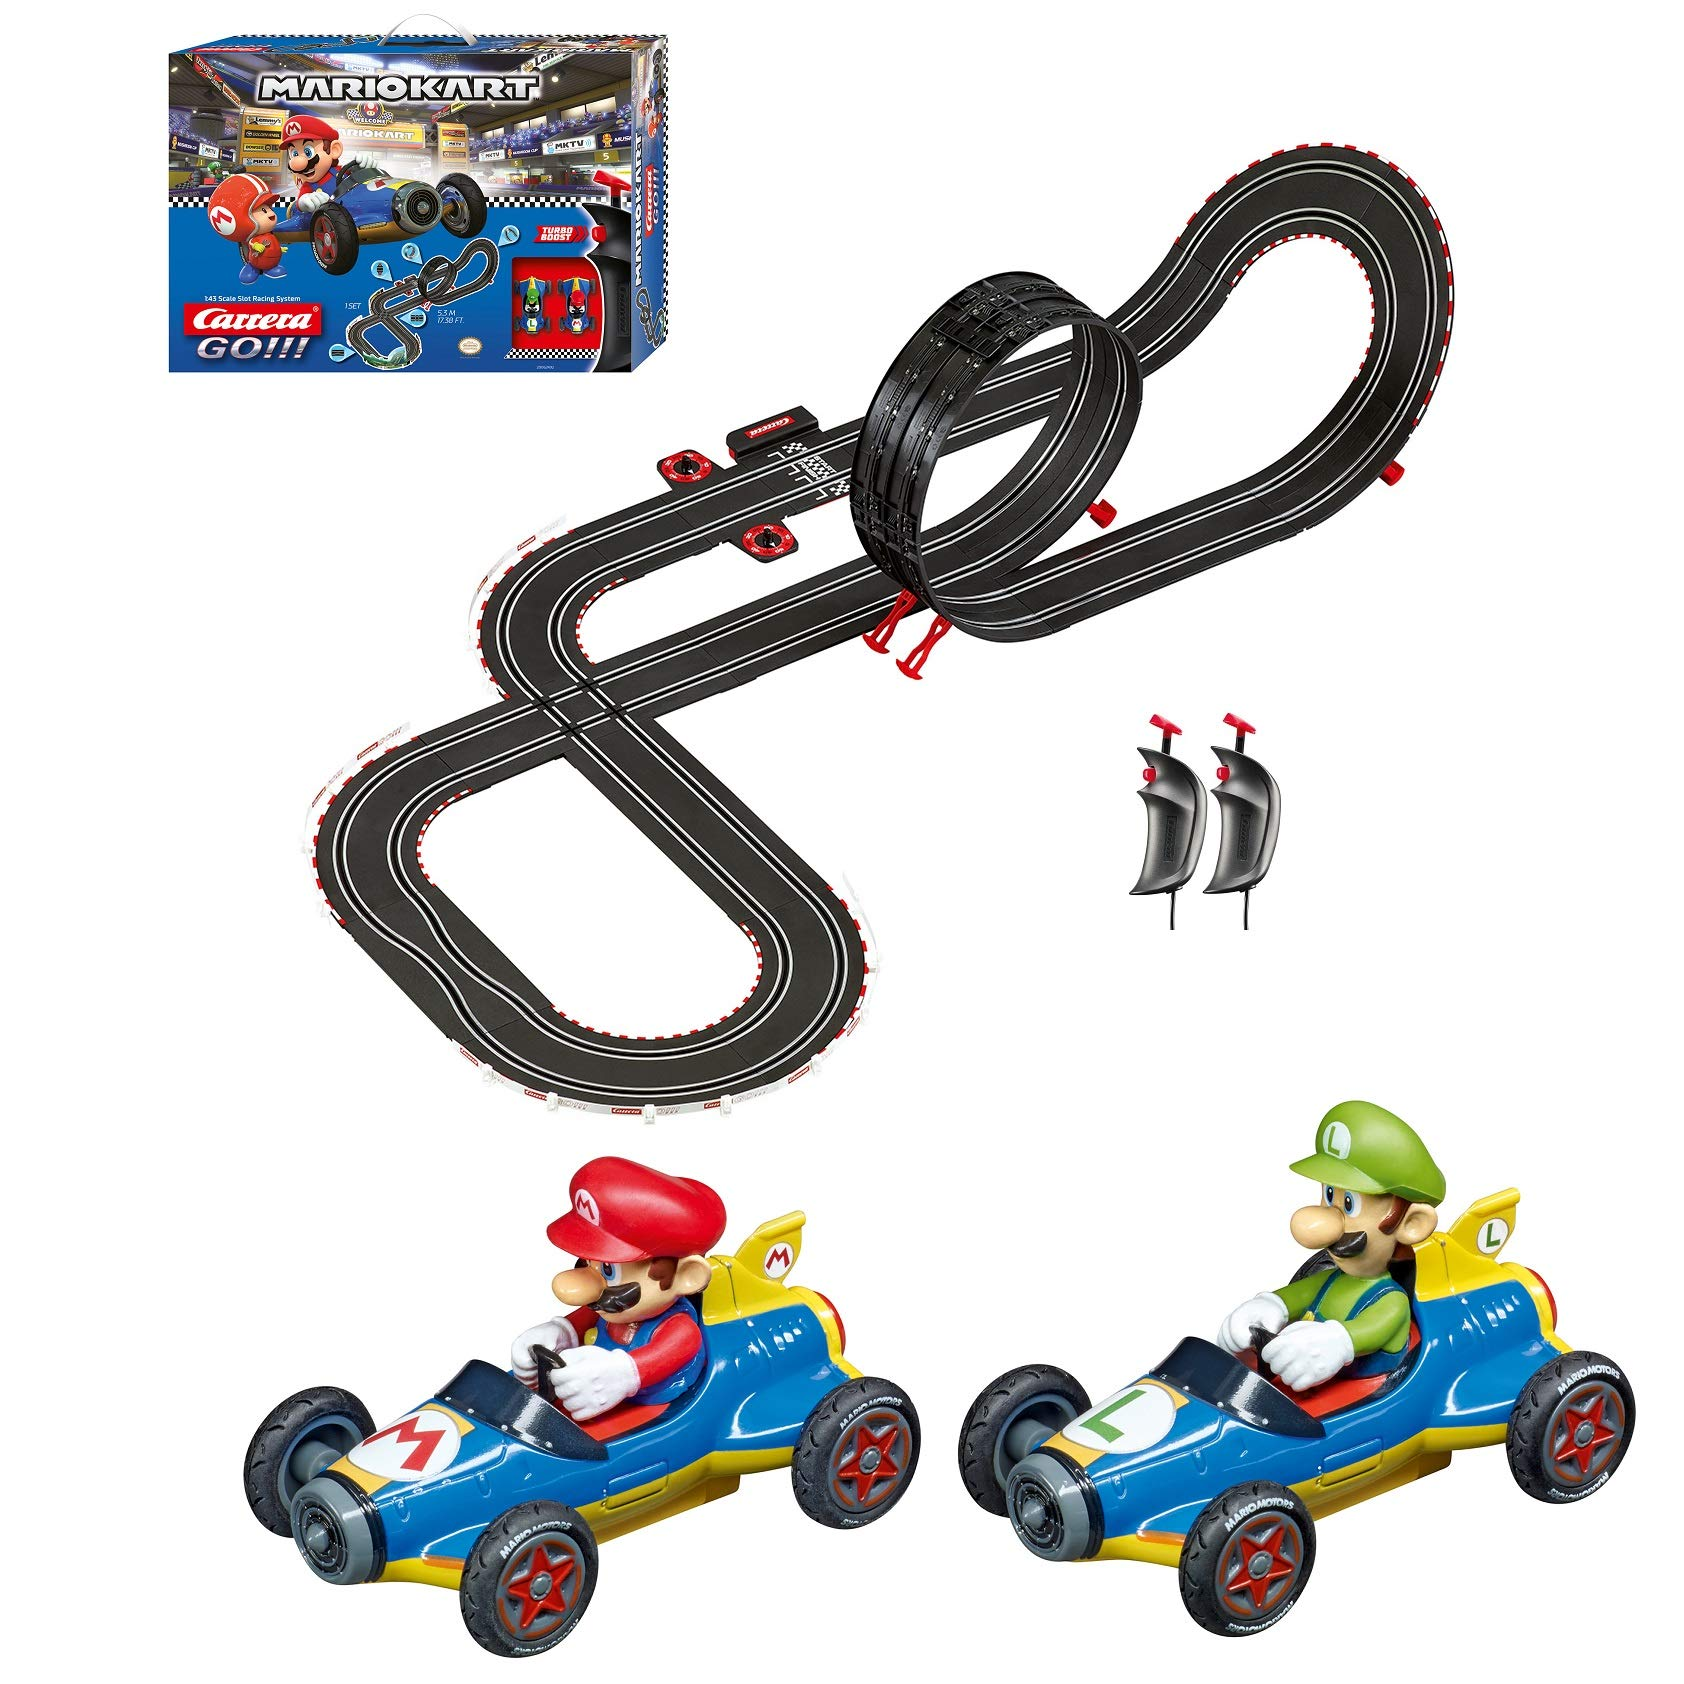 Carrera GO!!! 62492 Mario Kart Mach 8 Electric Slot Car Racing Track Set 1:43 Scale feat. Mario and Luigi by Carrera